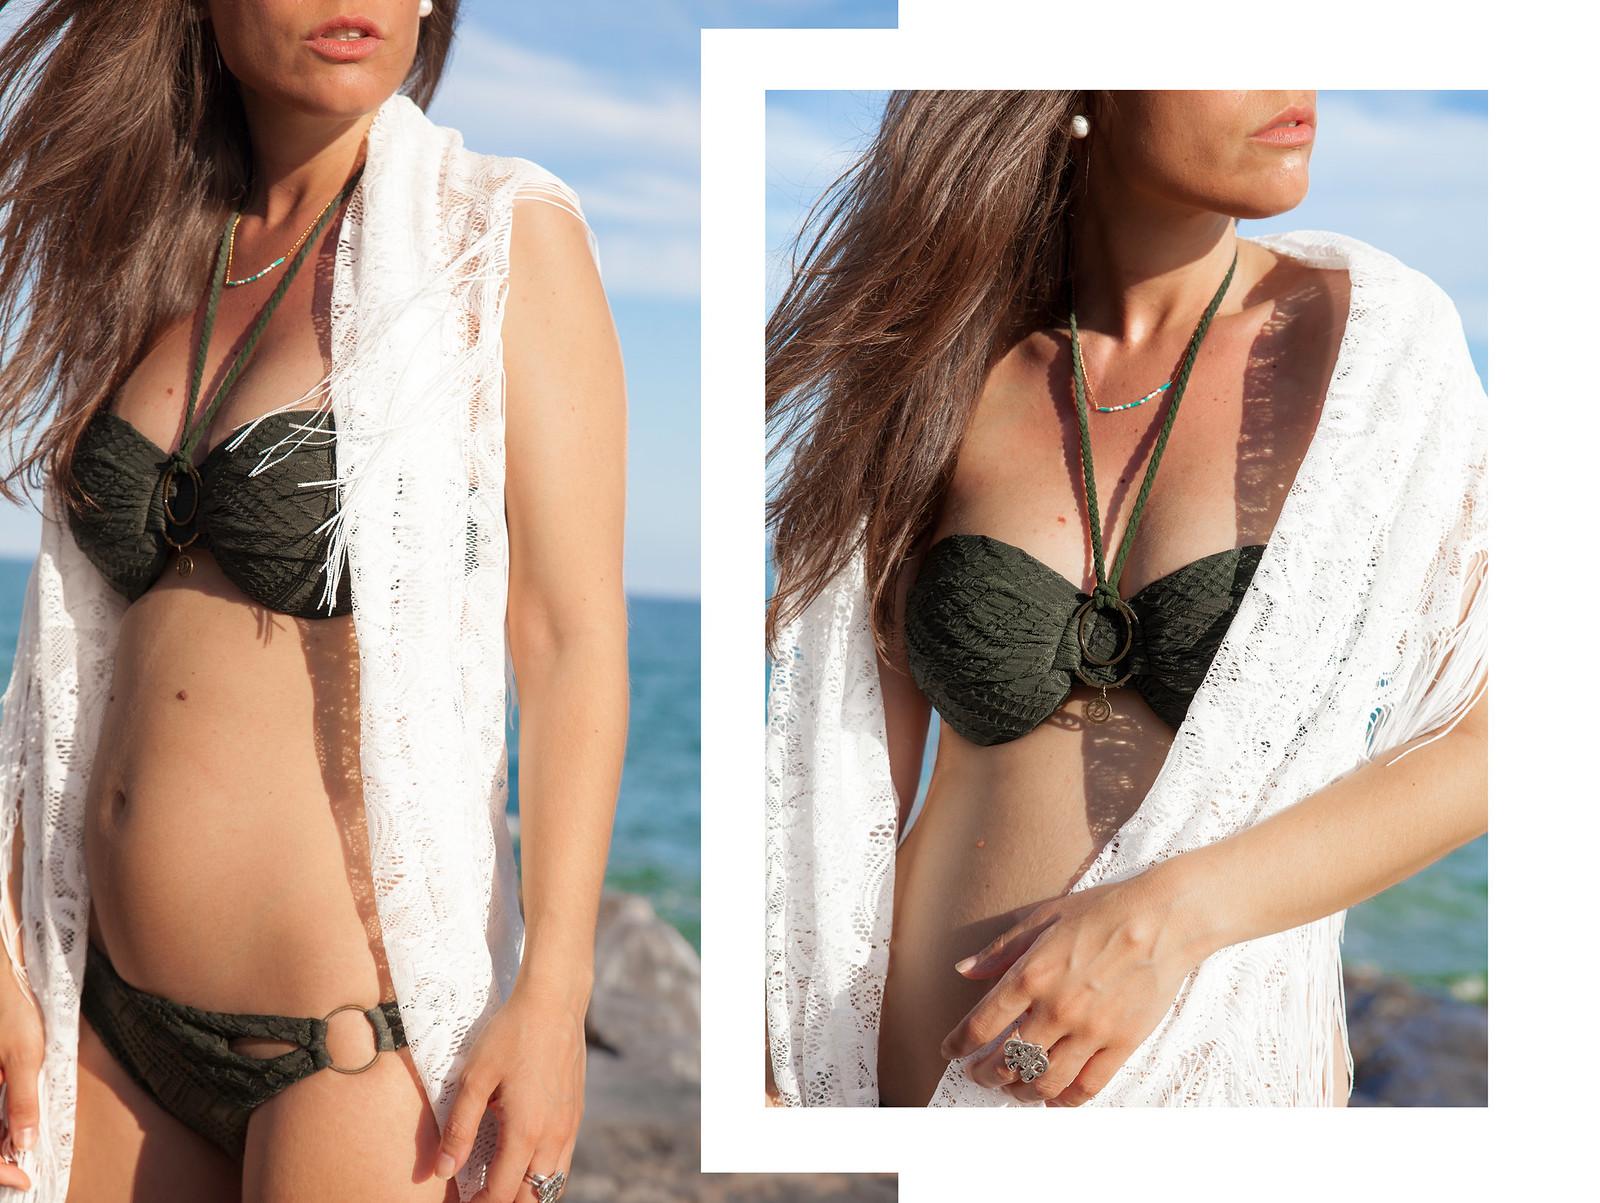 04_Hunker_Moller_Bikini_Comodo_embarazada_theguestgirl_laura_santolaria_influencer_moda_embarazada